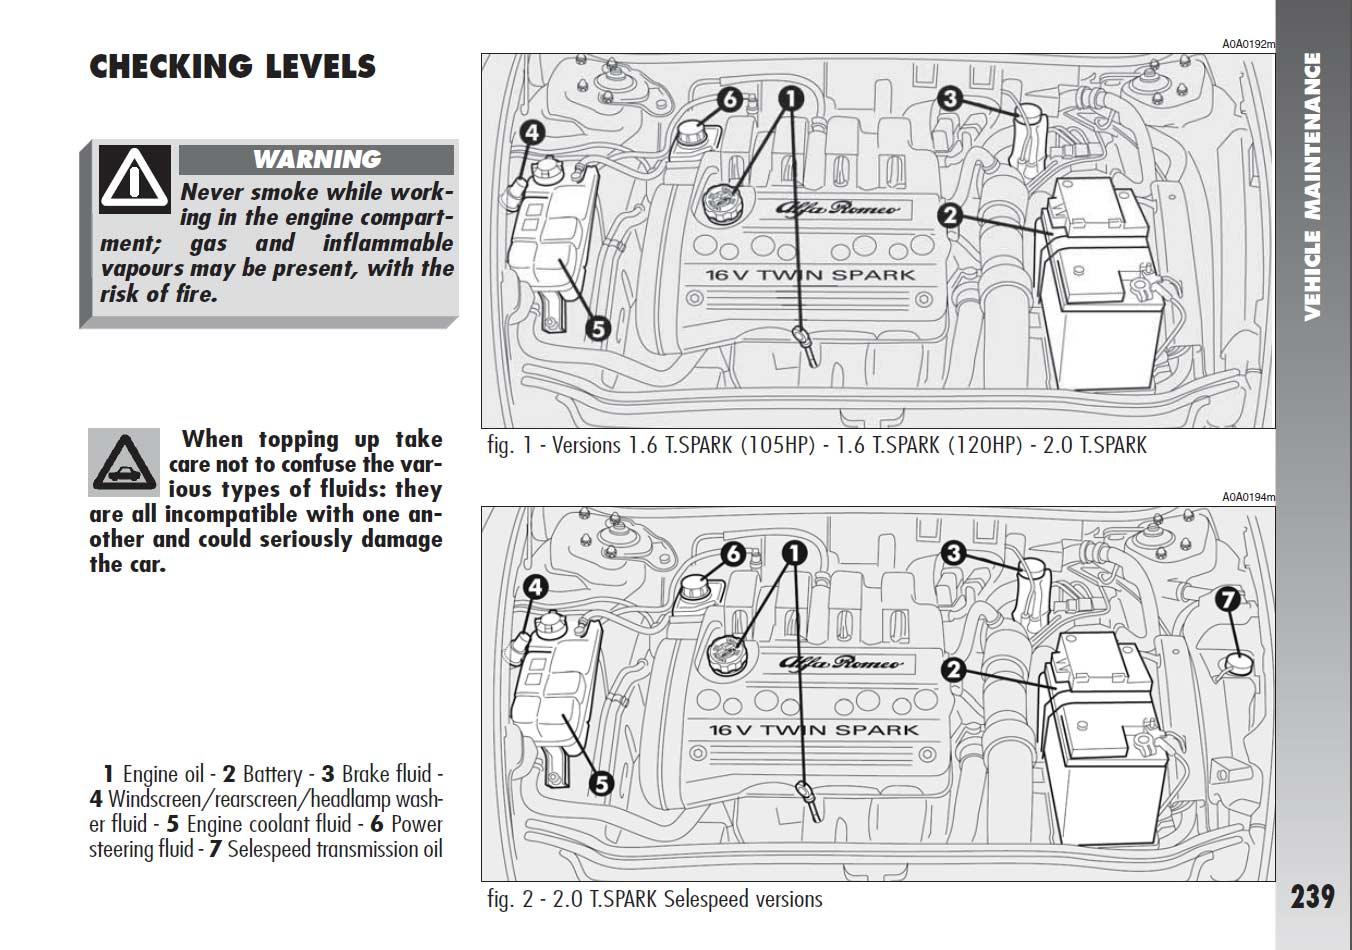 Scotts M01742s055325 Wiring Diagramm Alfa Romeo Engine Diagrams Alfa147petrolbatterylocation2quality80stripall 1986 Diagram